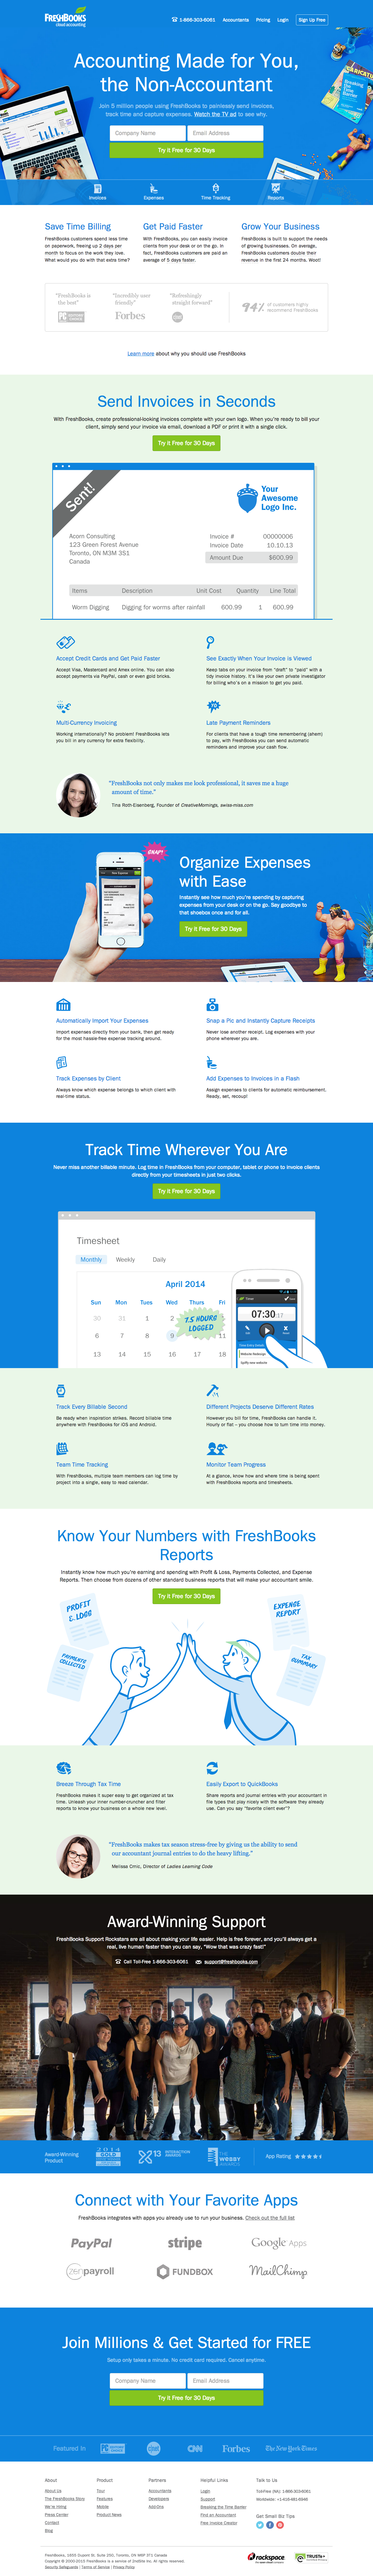 15 of the best website homepage design examples - creative splash